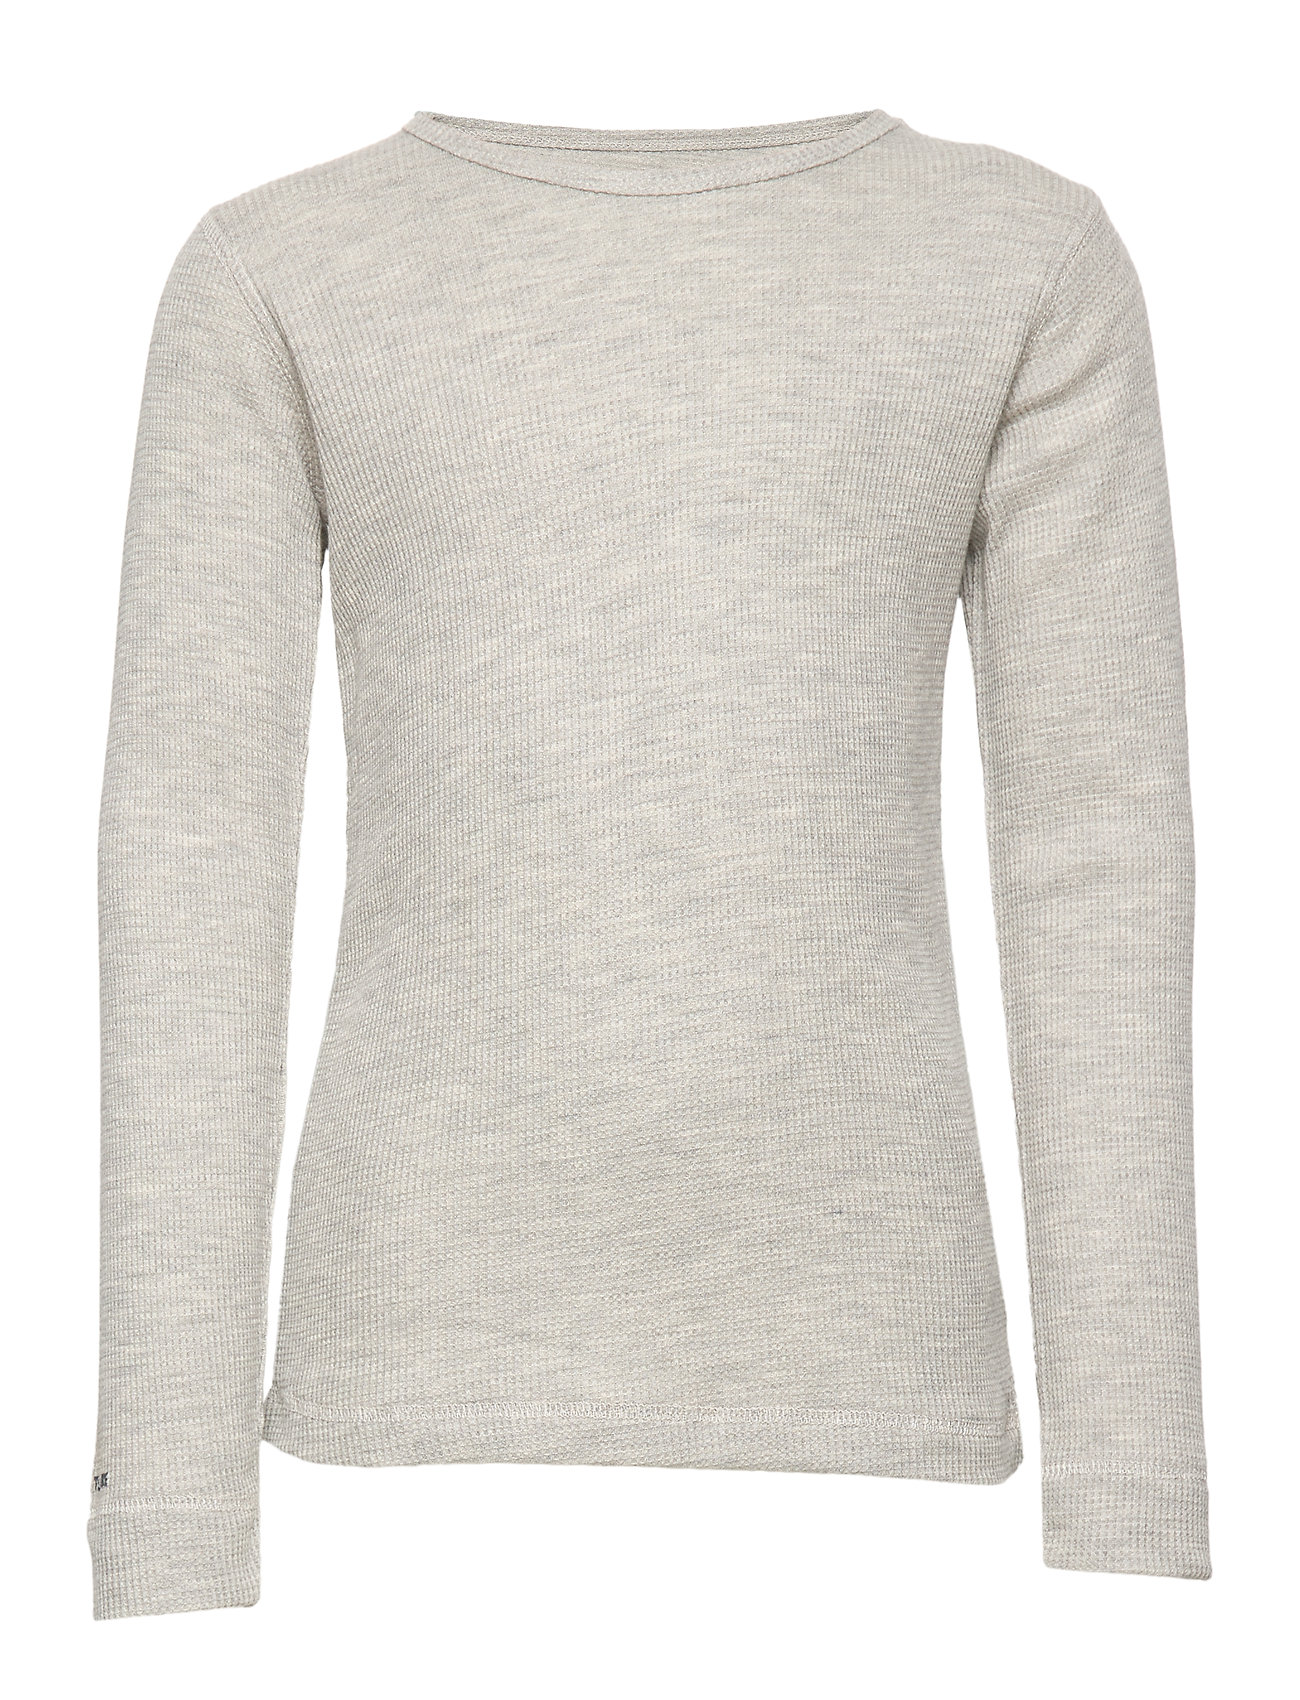 Mini A Ture Erion T-shirt, MK - LIGHT GREY MELANGE